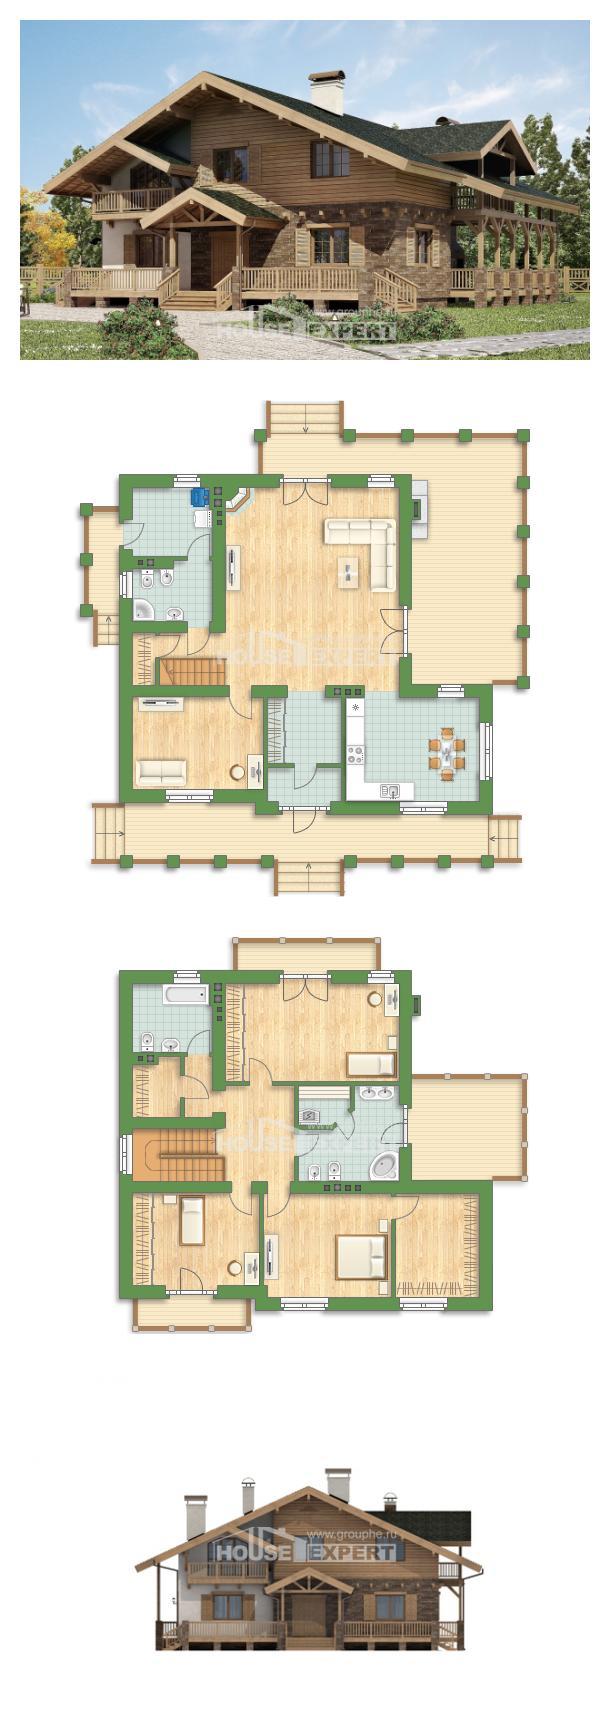 Проект дома 250-003-Л   House Expert